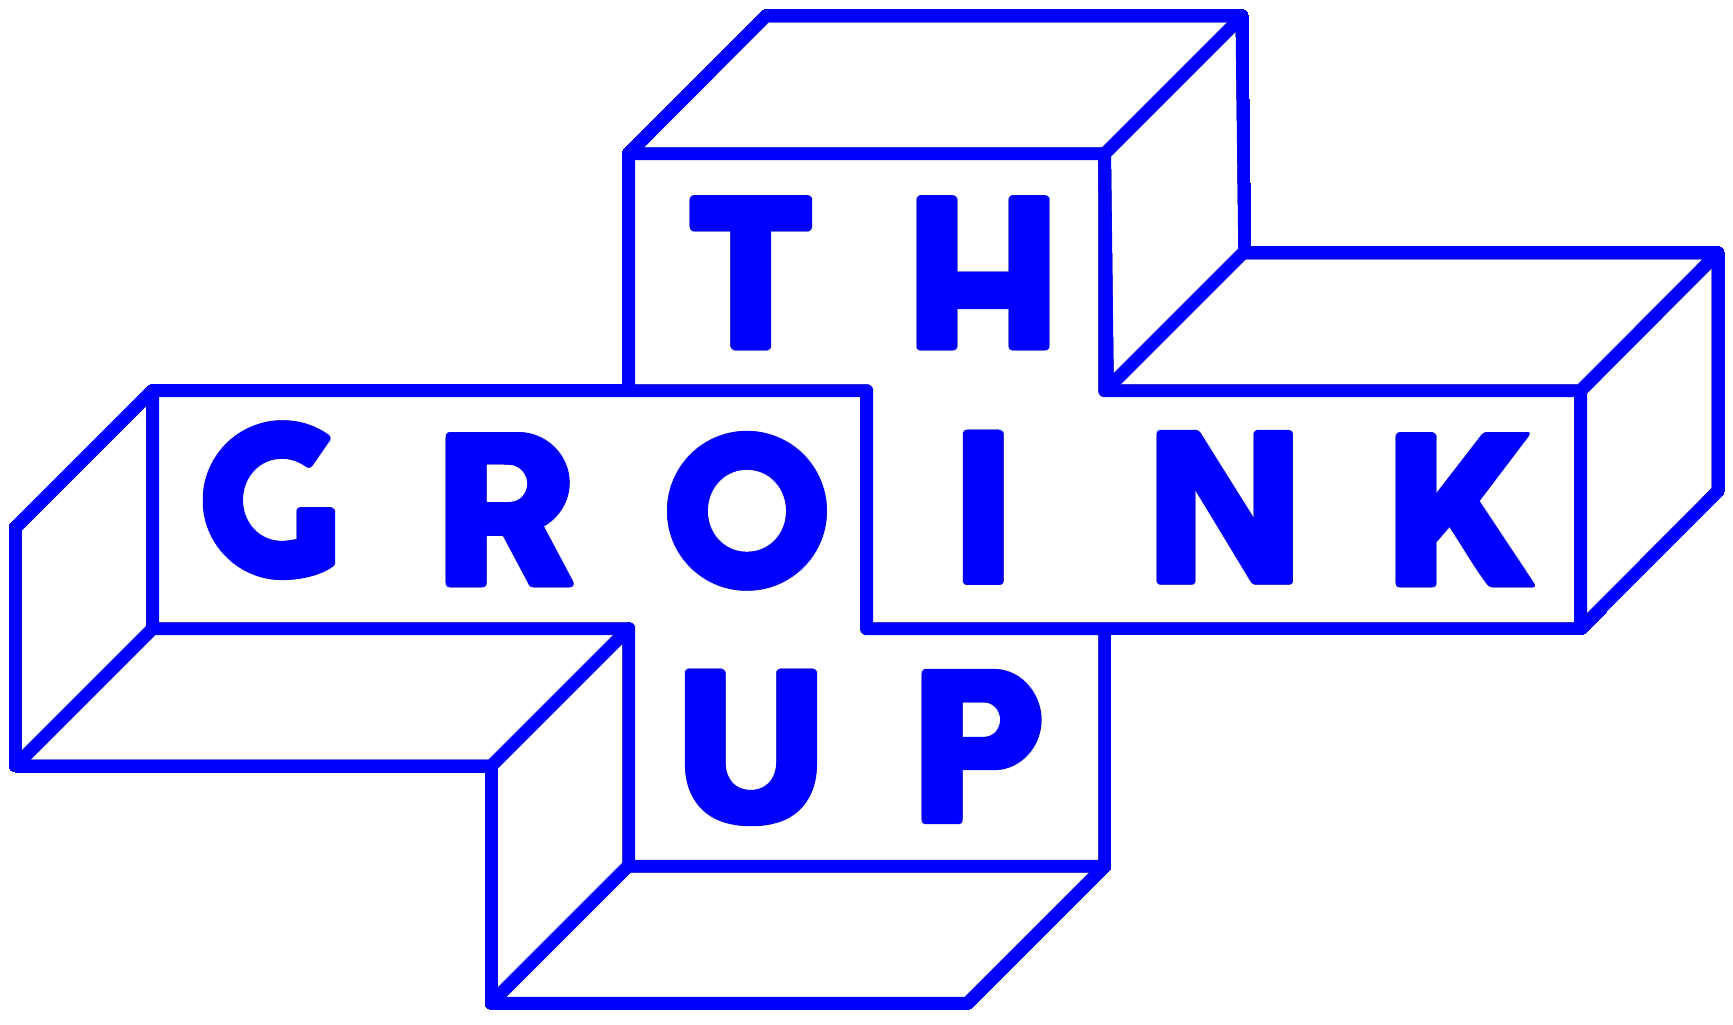 groupthink_logo_solid_blue.png